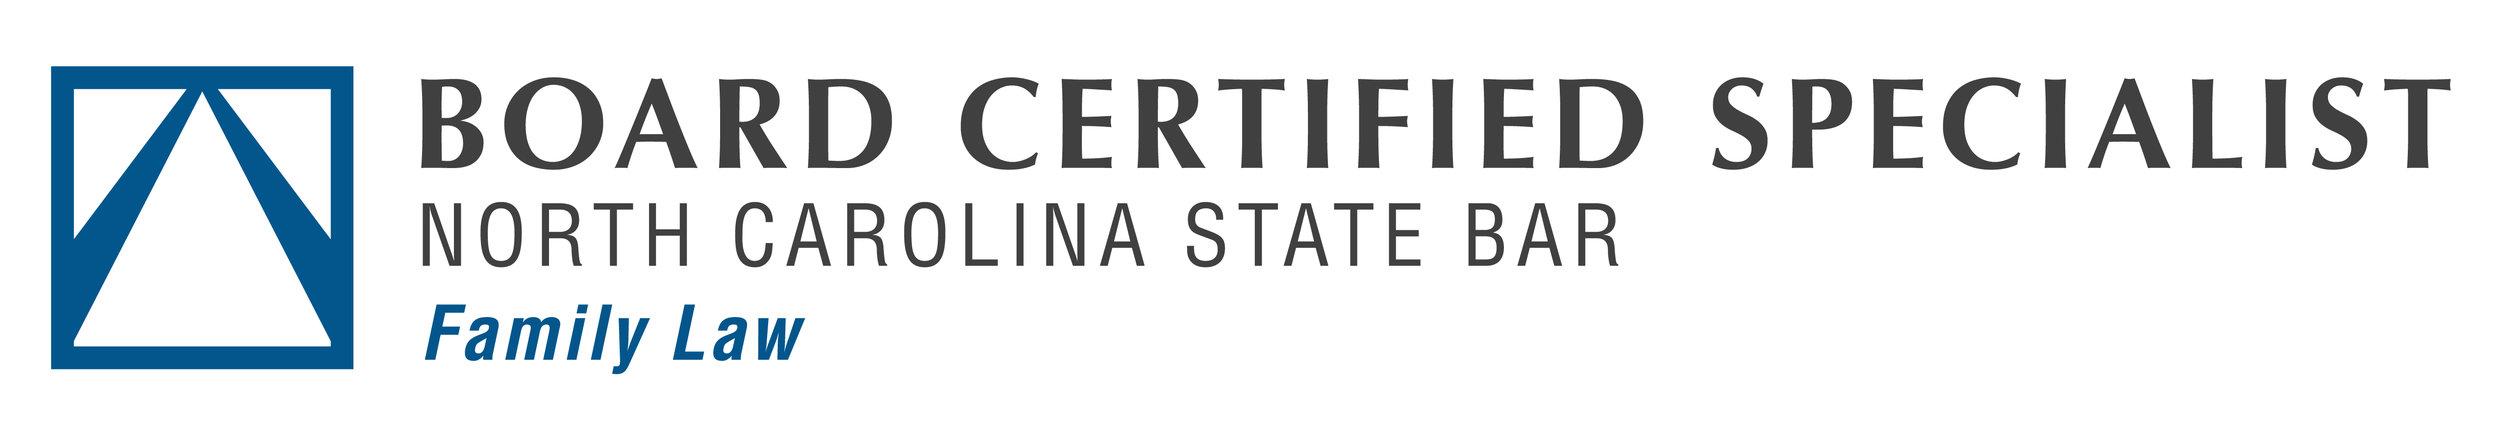 Specialist logo- Family Law.jpg